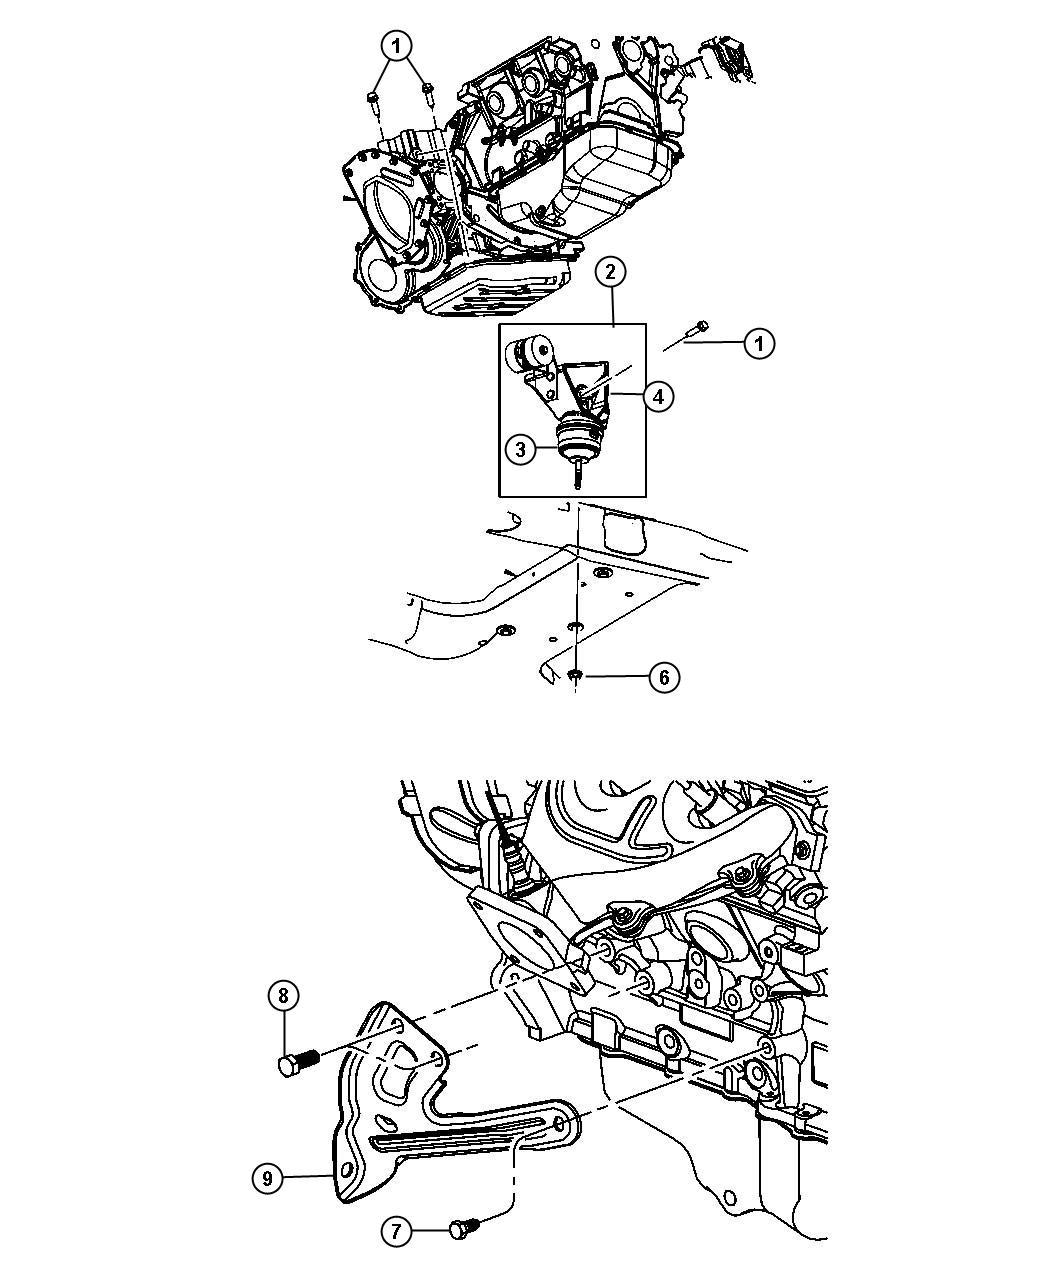 2008 Chrysler Pacifica Isolator. Engine mount. Rear